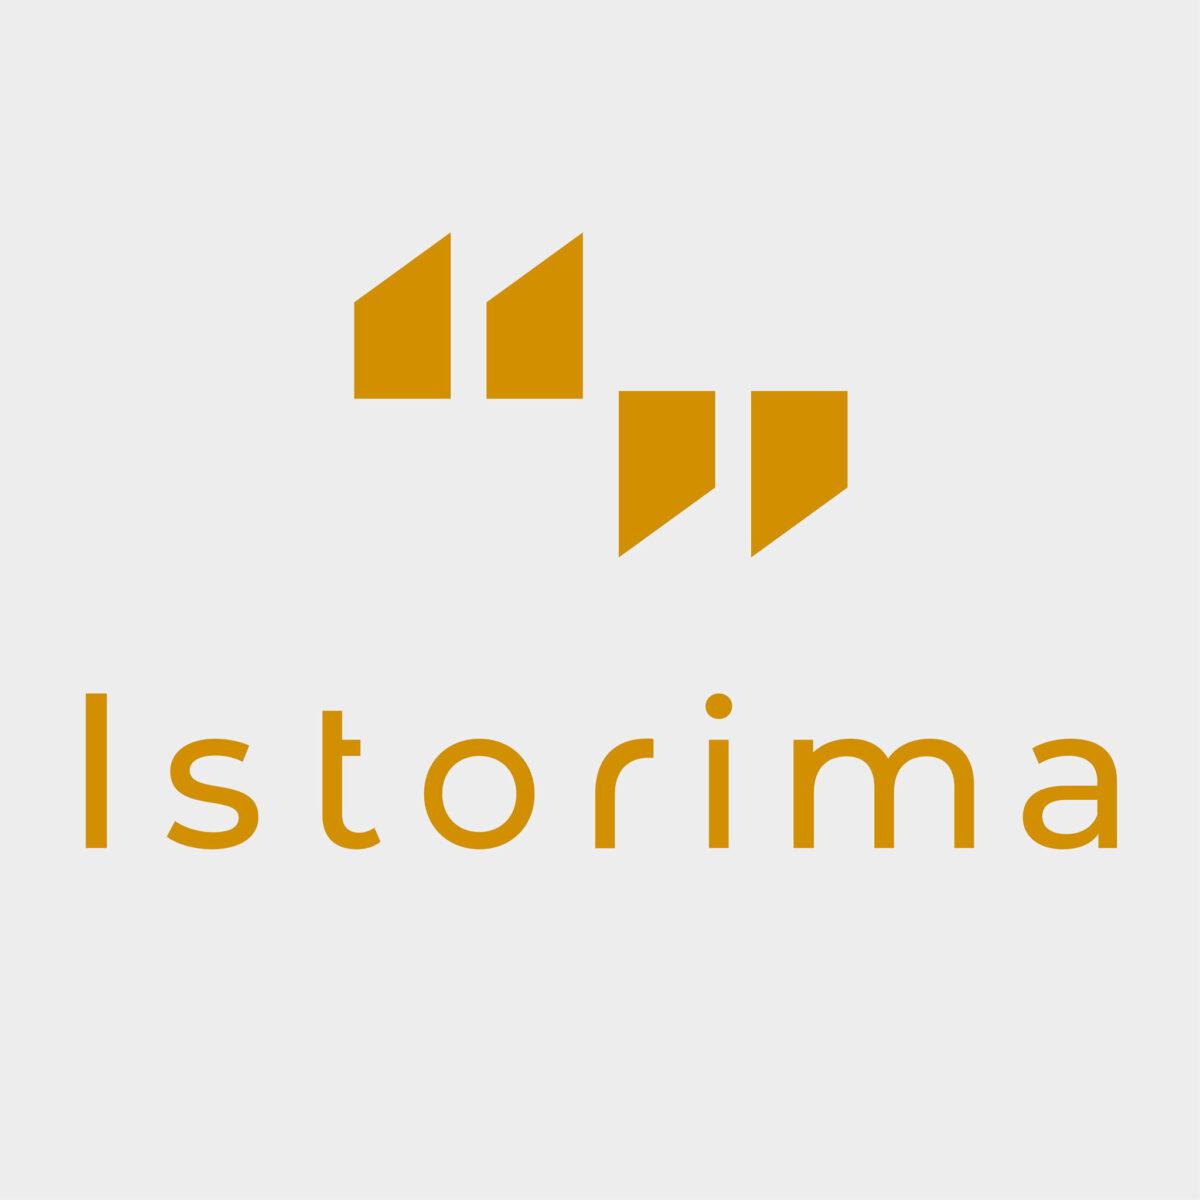 H ιστοσελίδα istorima.org σηματοδοτεί την έναρξη του μεγαλύτερου έργου συλλογής προφορικών ιστοριών που έγινε ποτέ στην Ελλάδα.